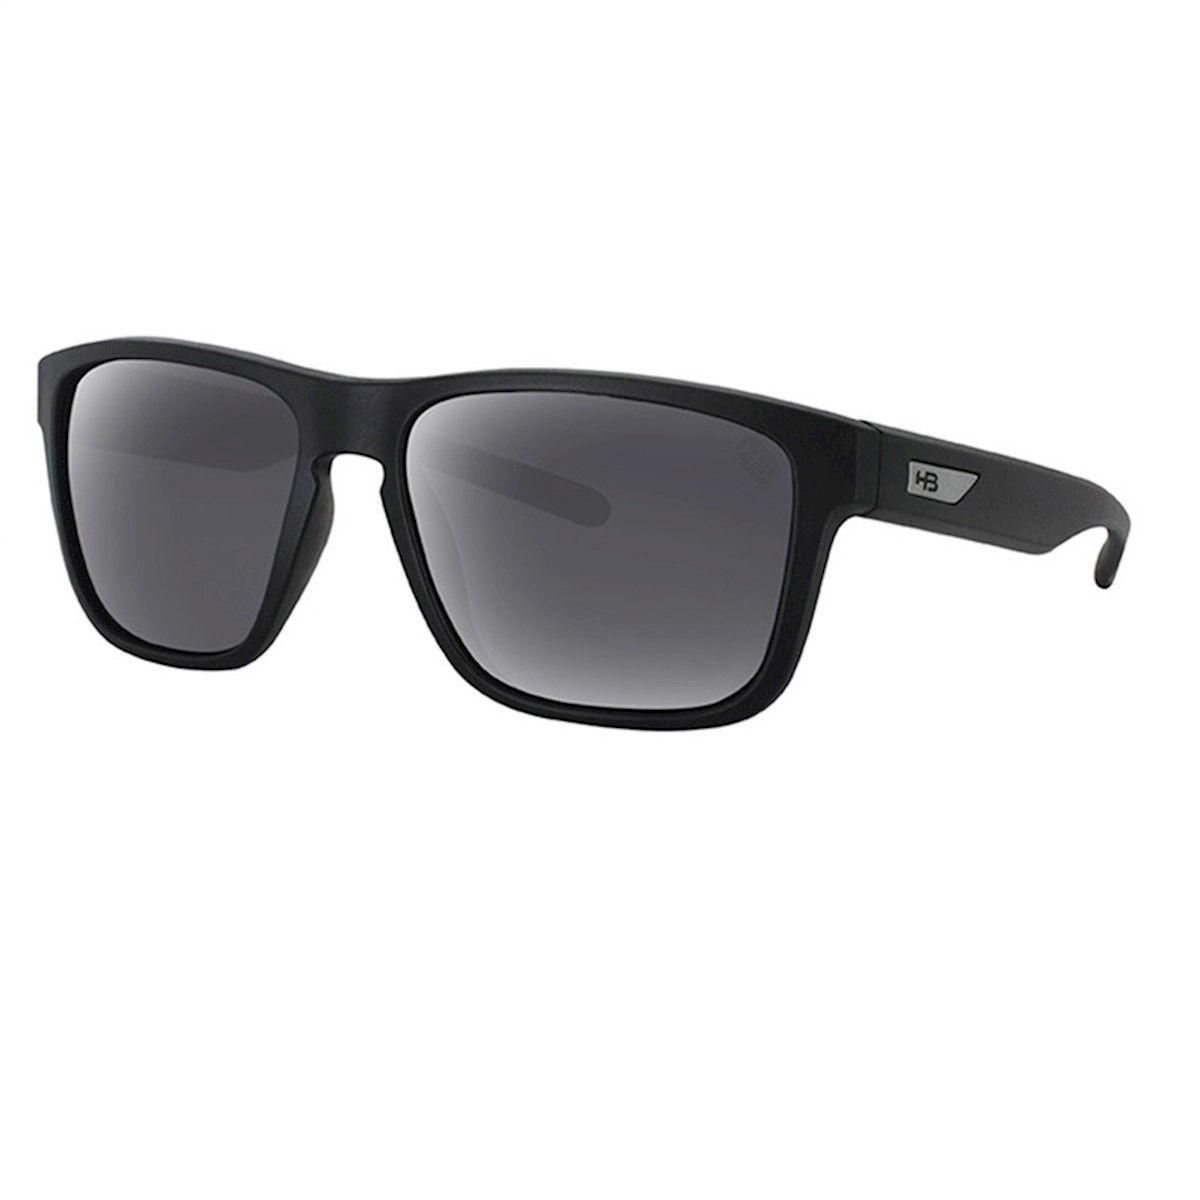 Óculos de sol HB Stab Gloss Black Gray